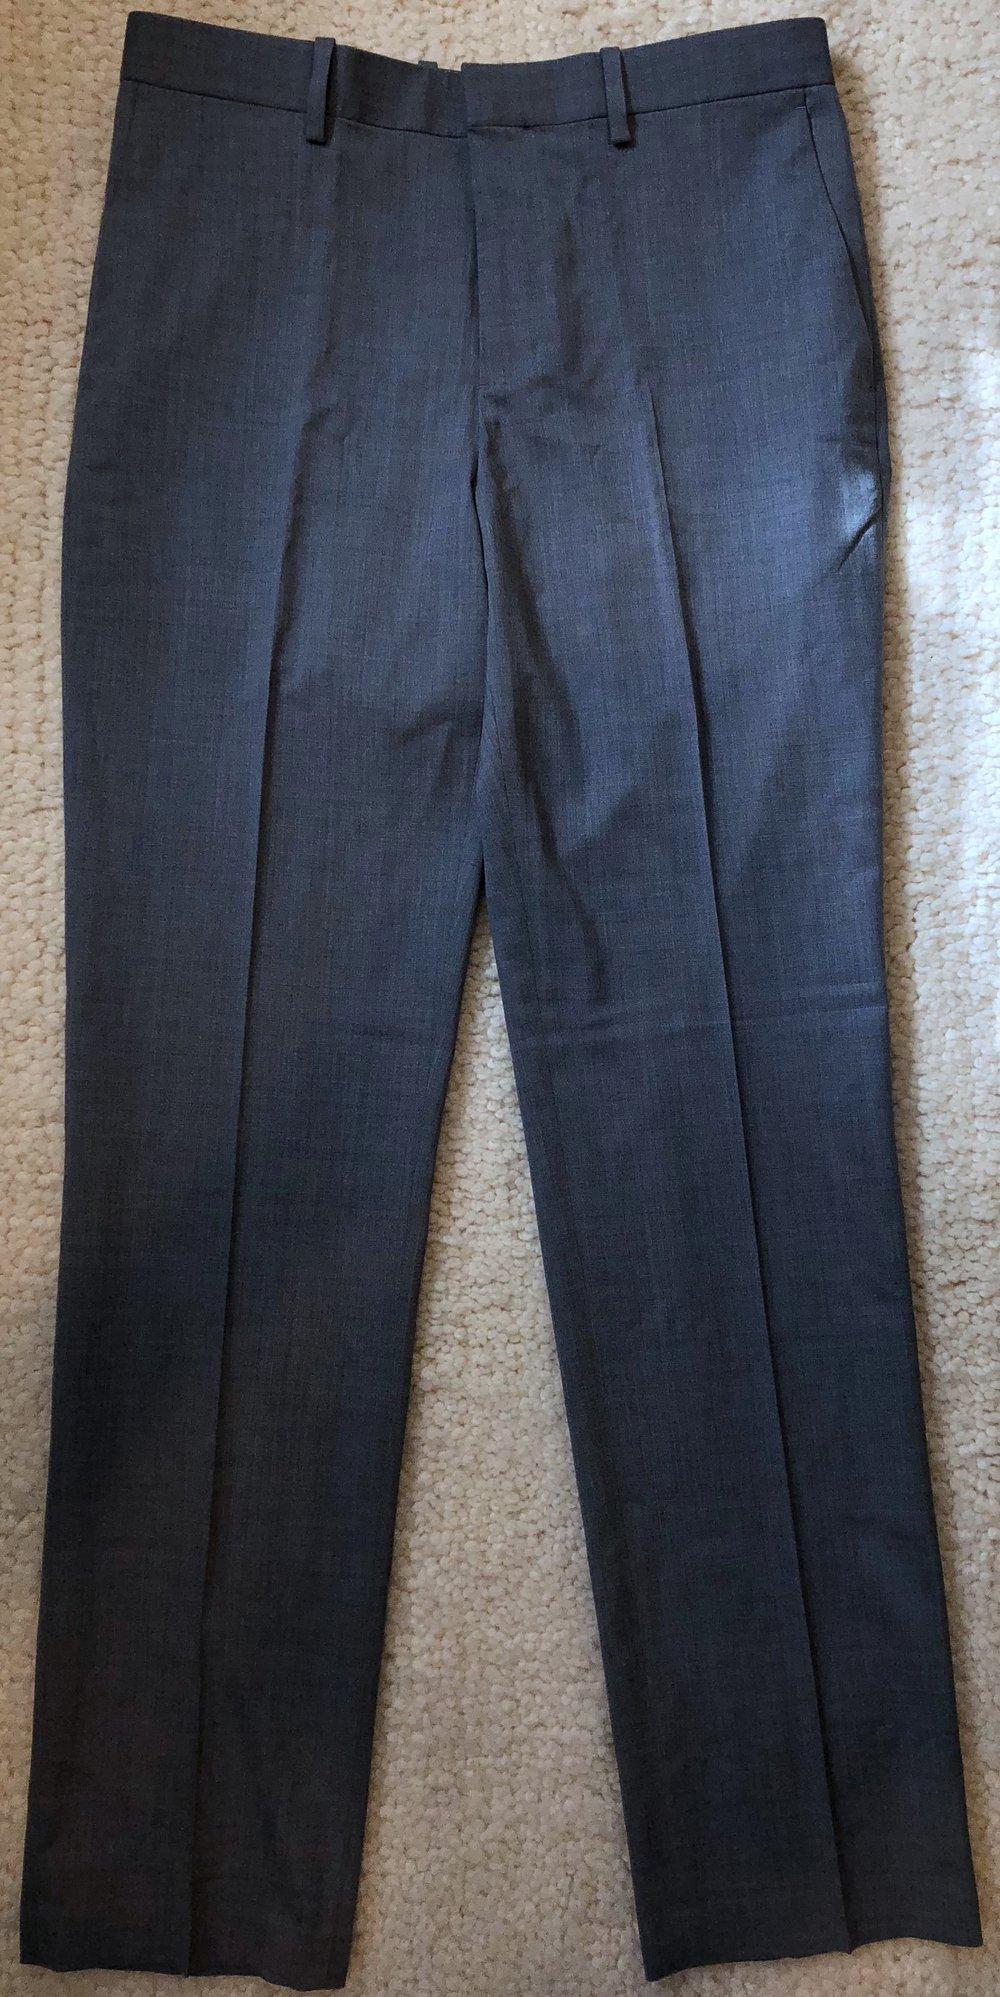 Mens Linen Dress Pants Reviews